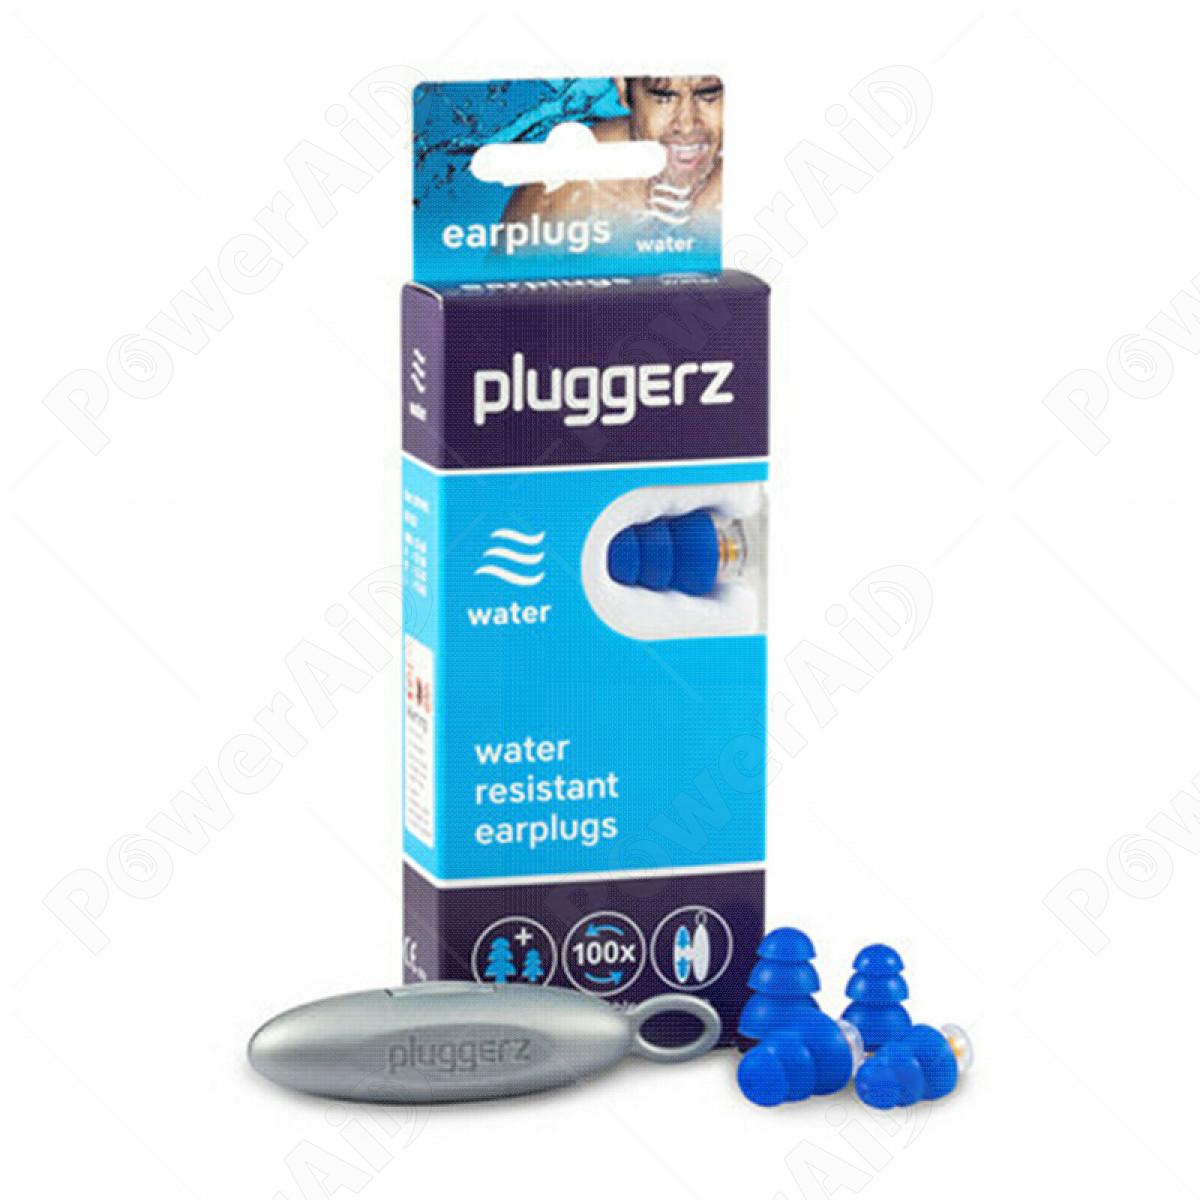 Pluggerz – Water Uni-Fit